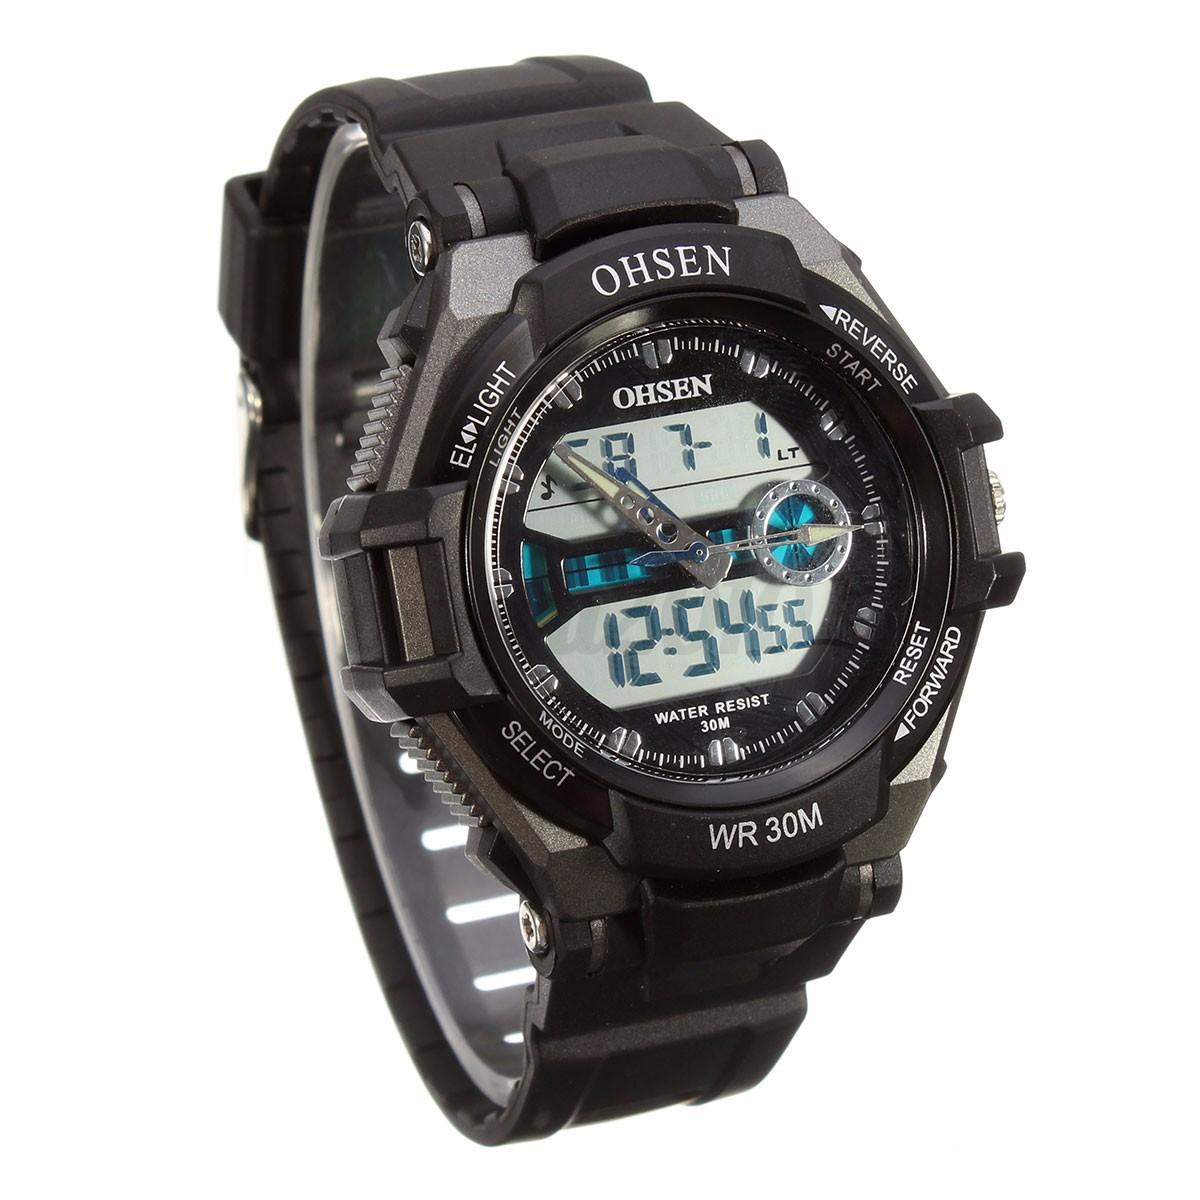 ohsen lcd digital montre quartz sport alarm chrono homme. Black Bedroom Furniture Sets. Home Design Ideas